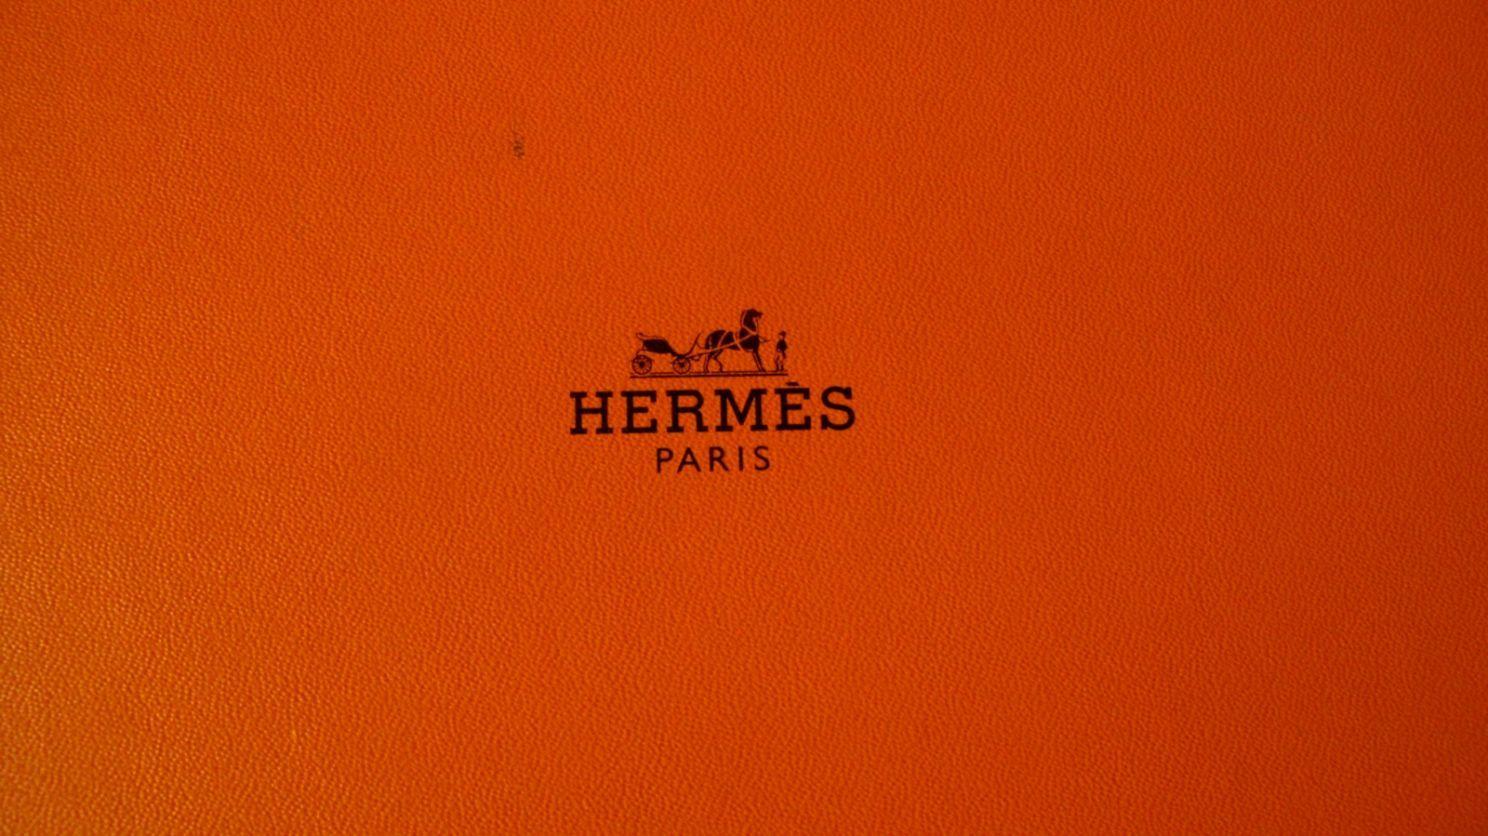 hermes wallpaper design ideas for your computer